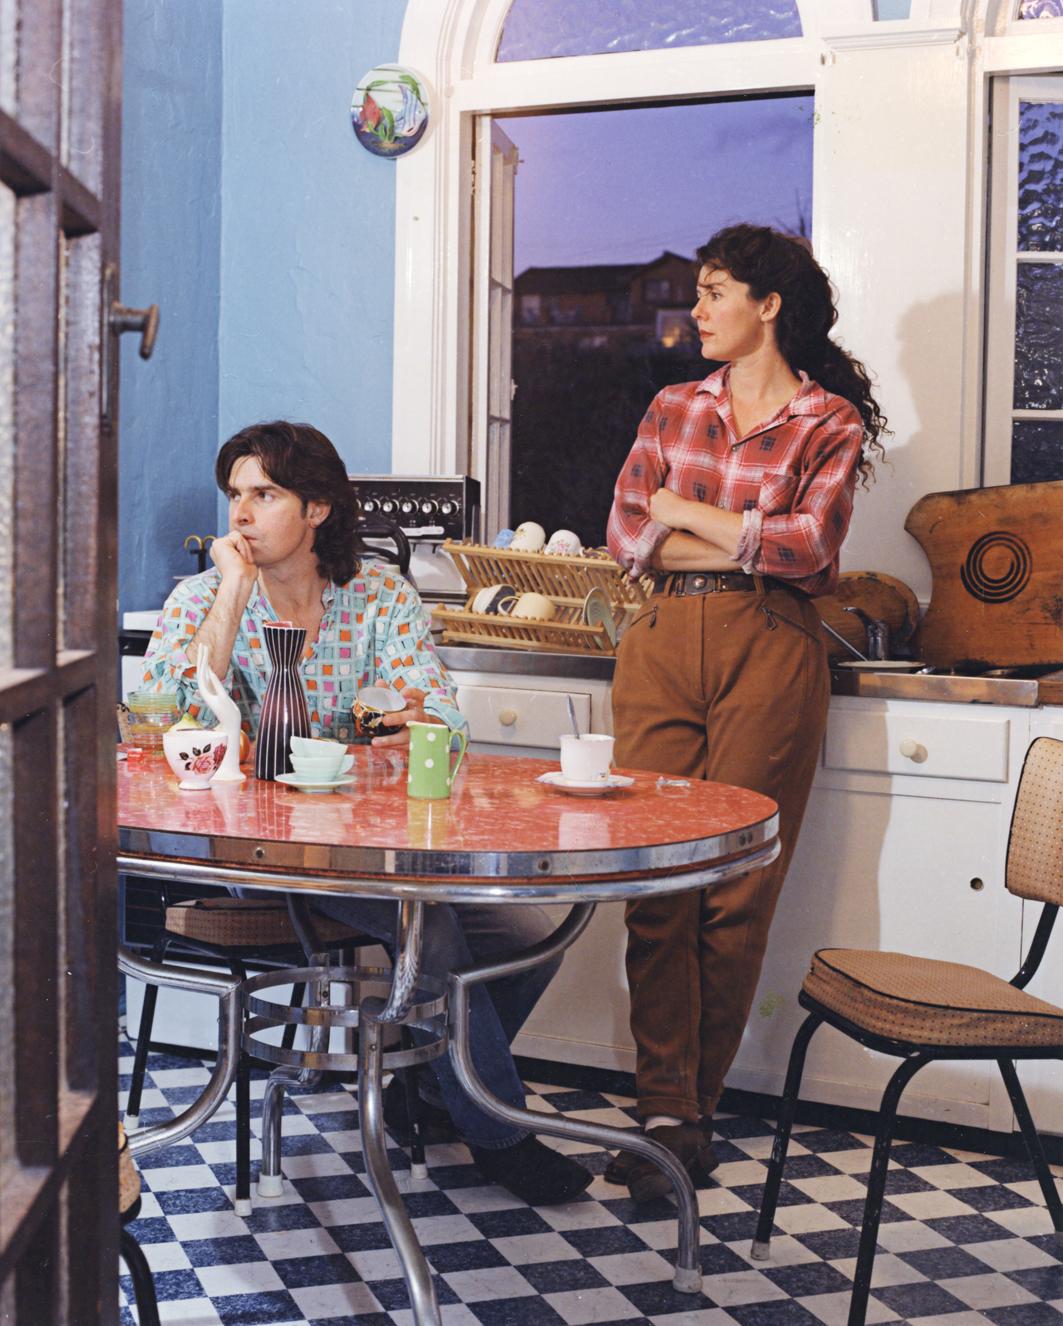 ANNE ZAHALKA   Saturday, 05:18 pm  1995 Duratran and Lightbox 162 x 125 x 25 cm